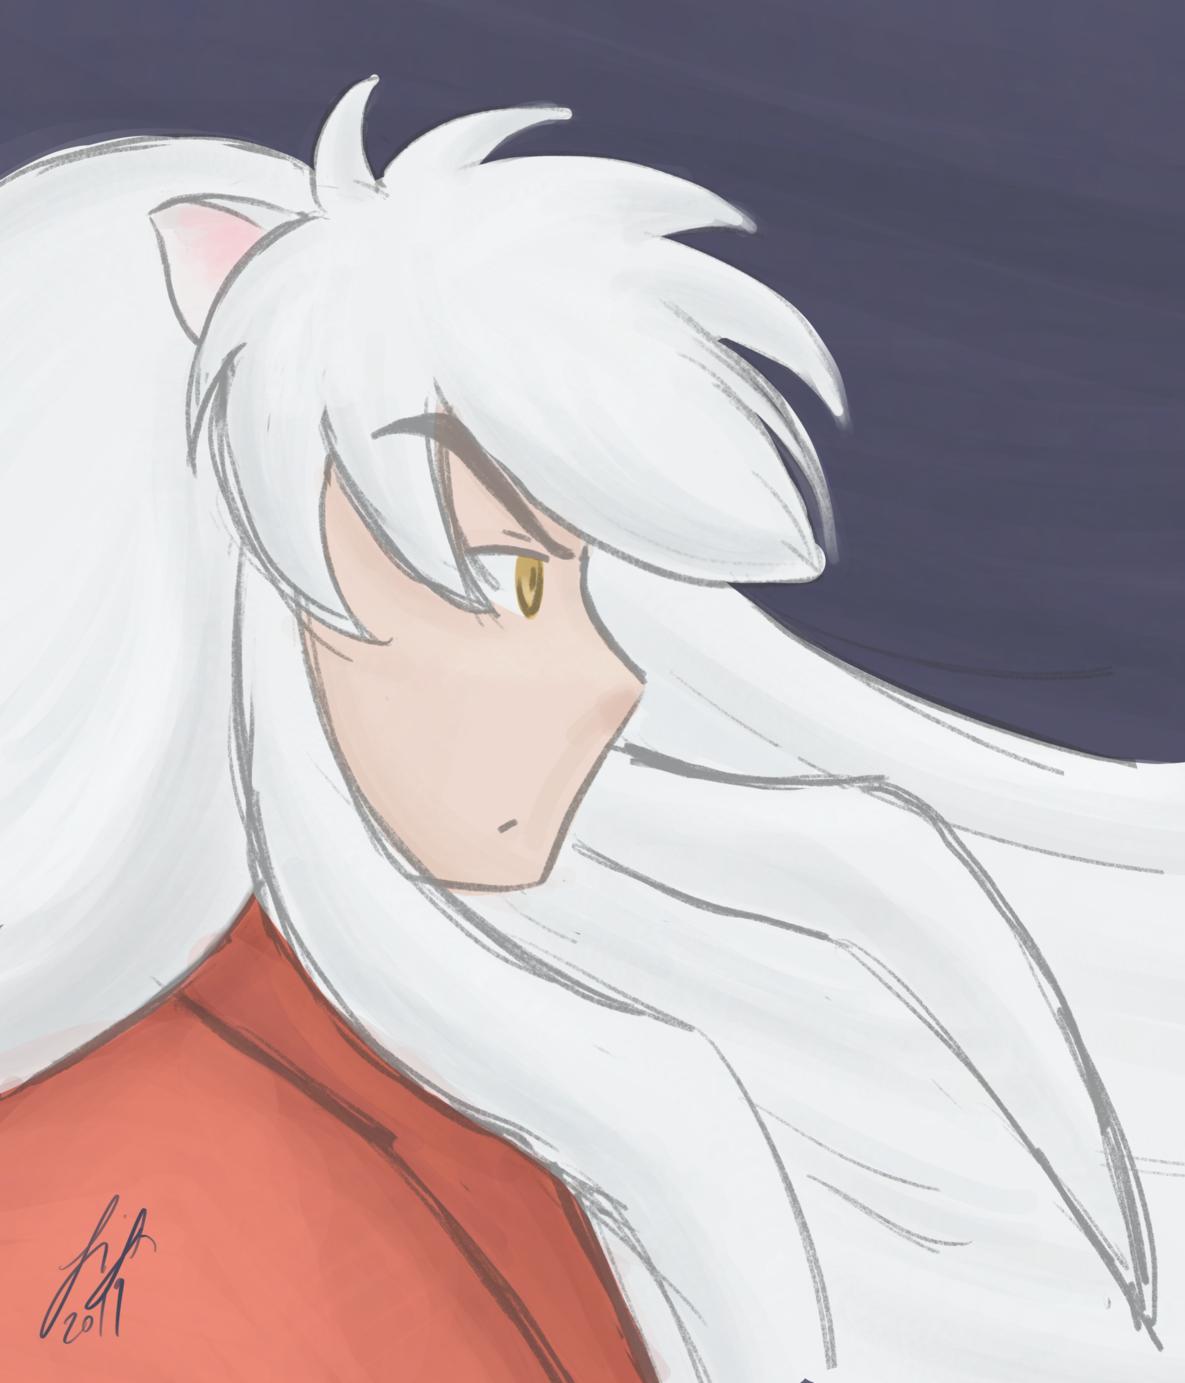 digital artwork, Inu Yasha, guy with long nearly white hair, yellow eyes and dog ears